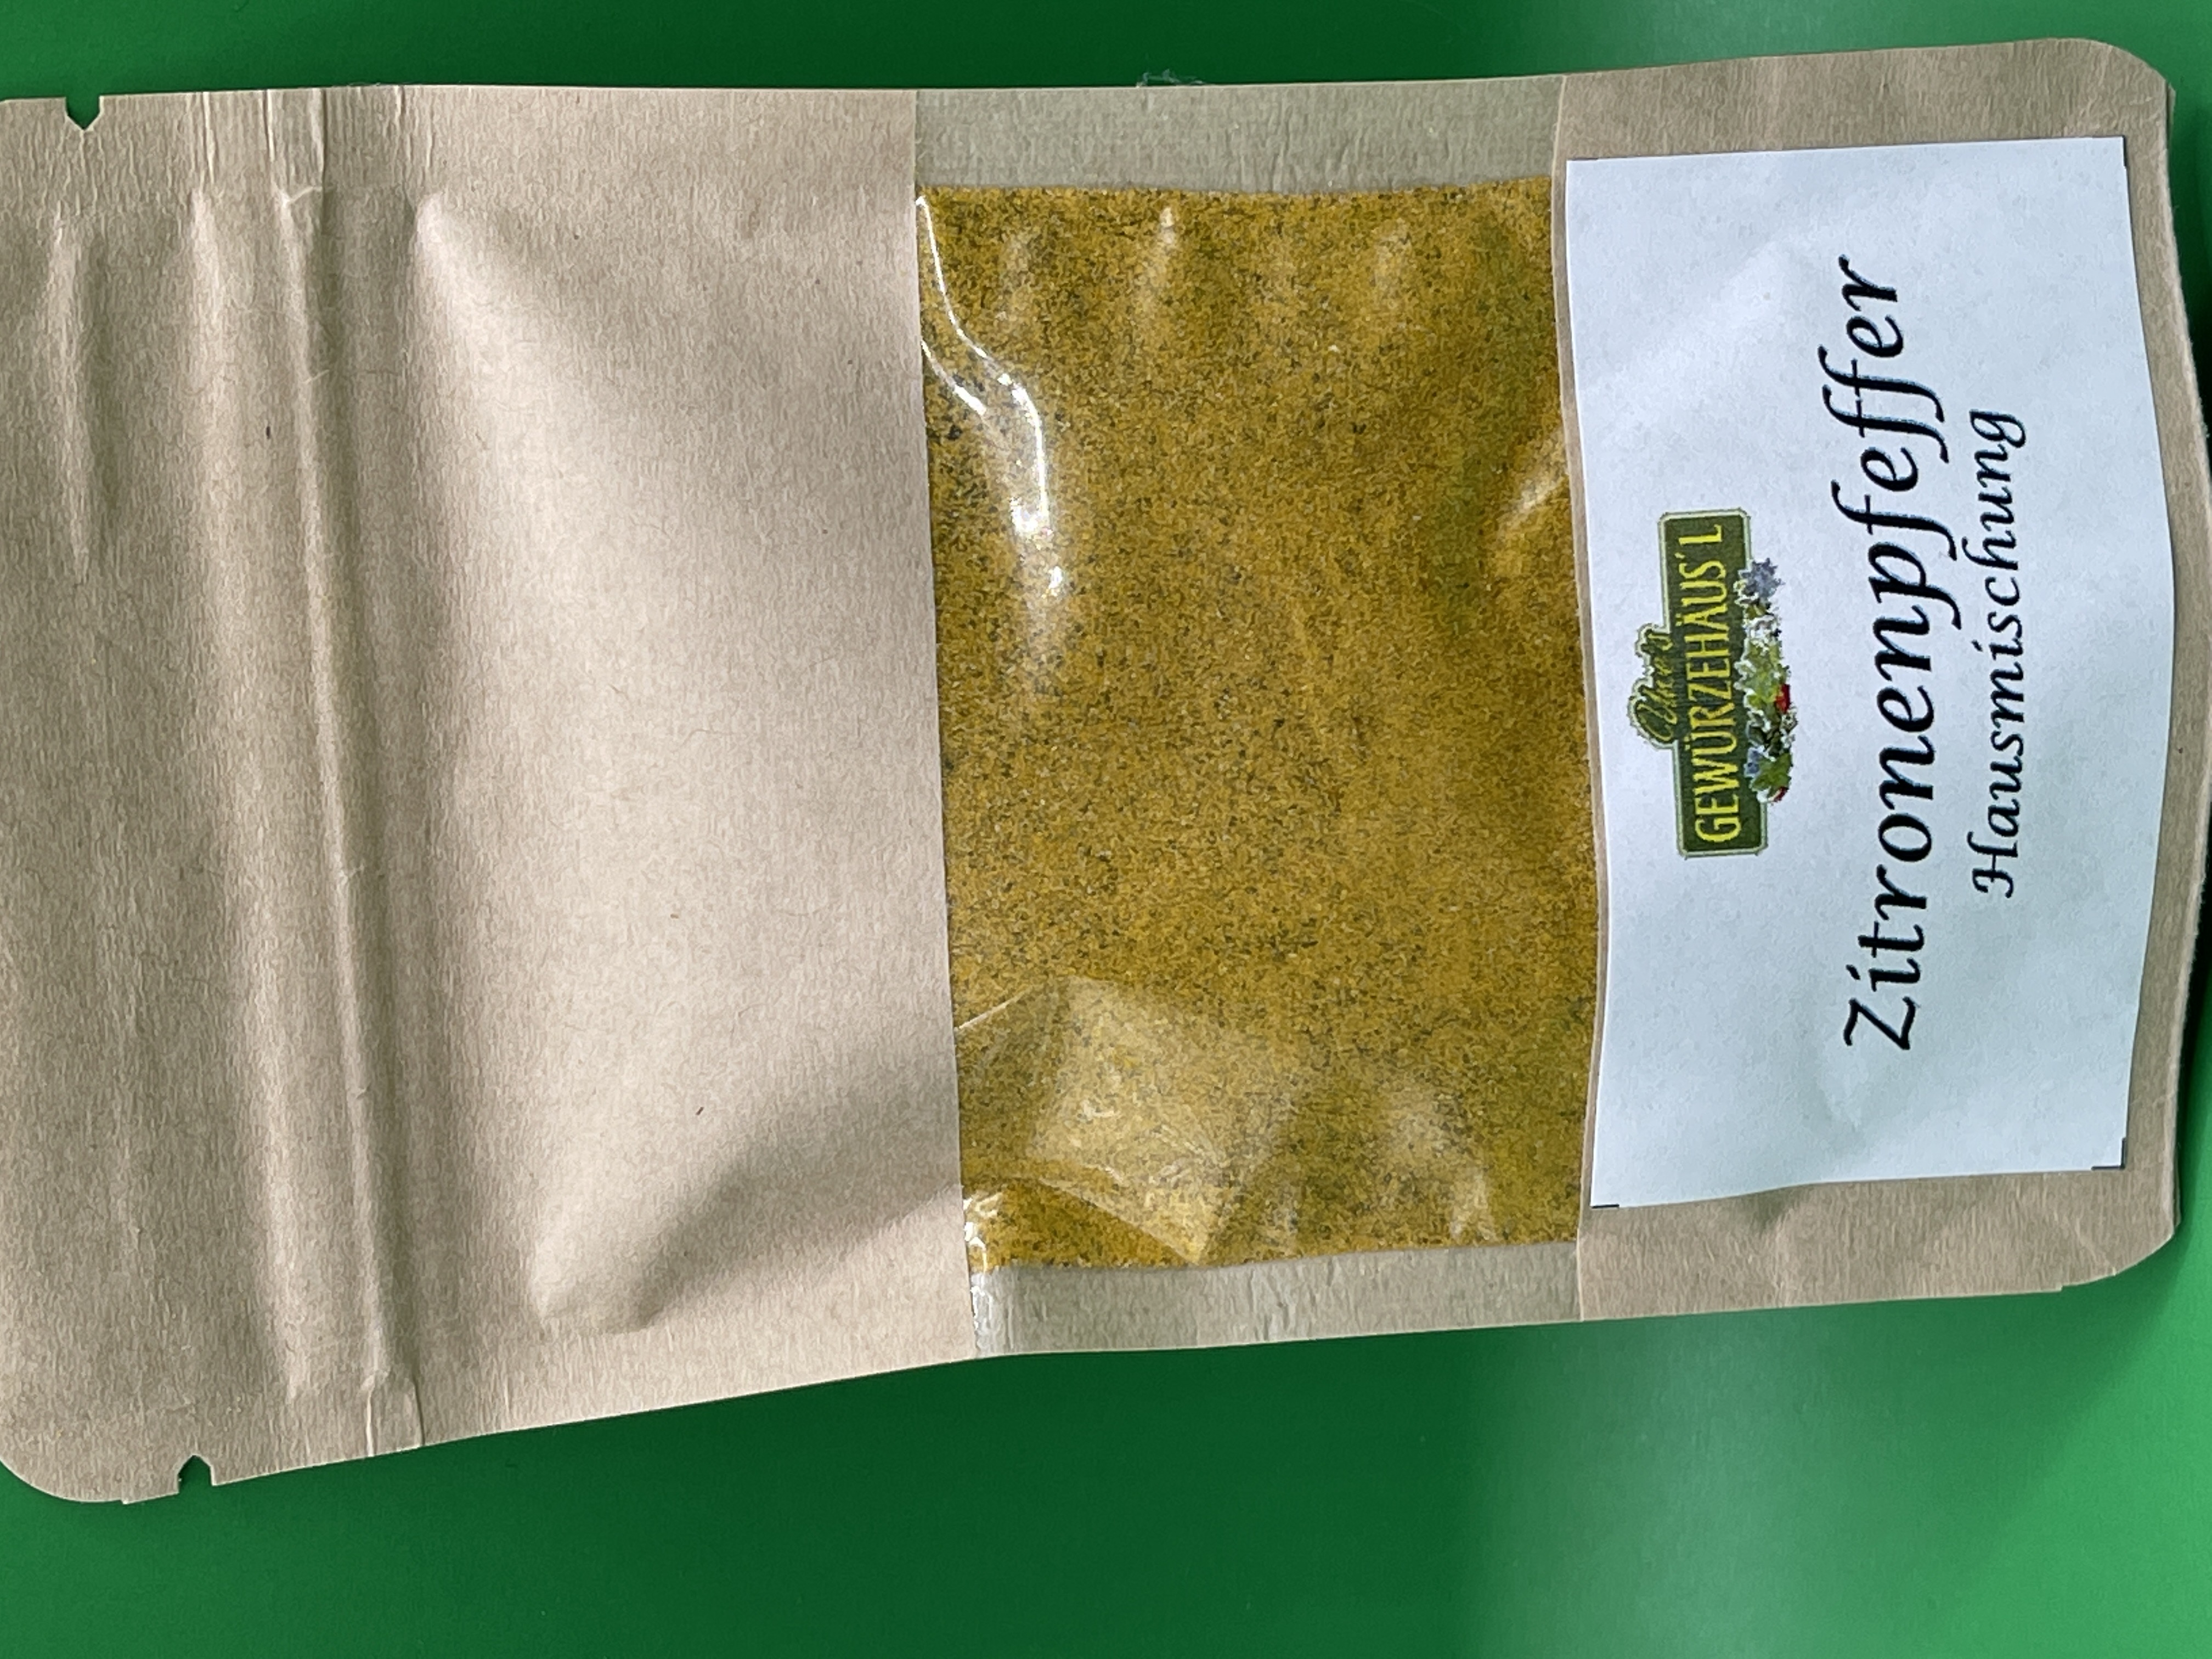 Zitronenpfeffer Gewürzmischung Schwarzer Pfeffer, Zitronenschalen (unbehandelt) Curcuma 40g